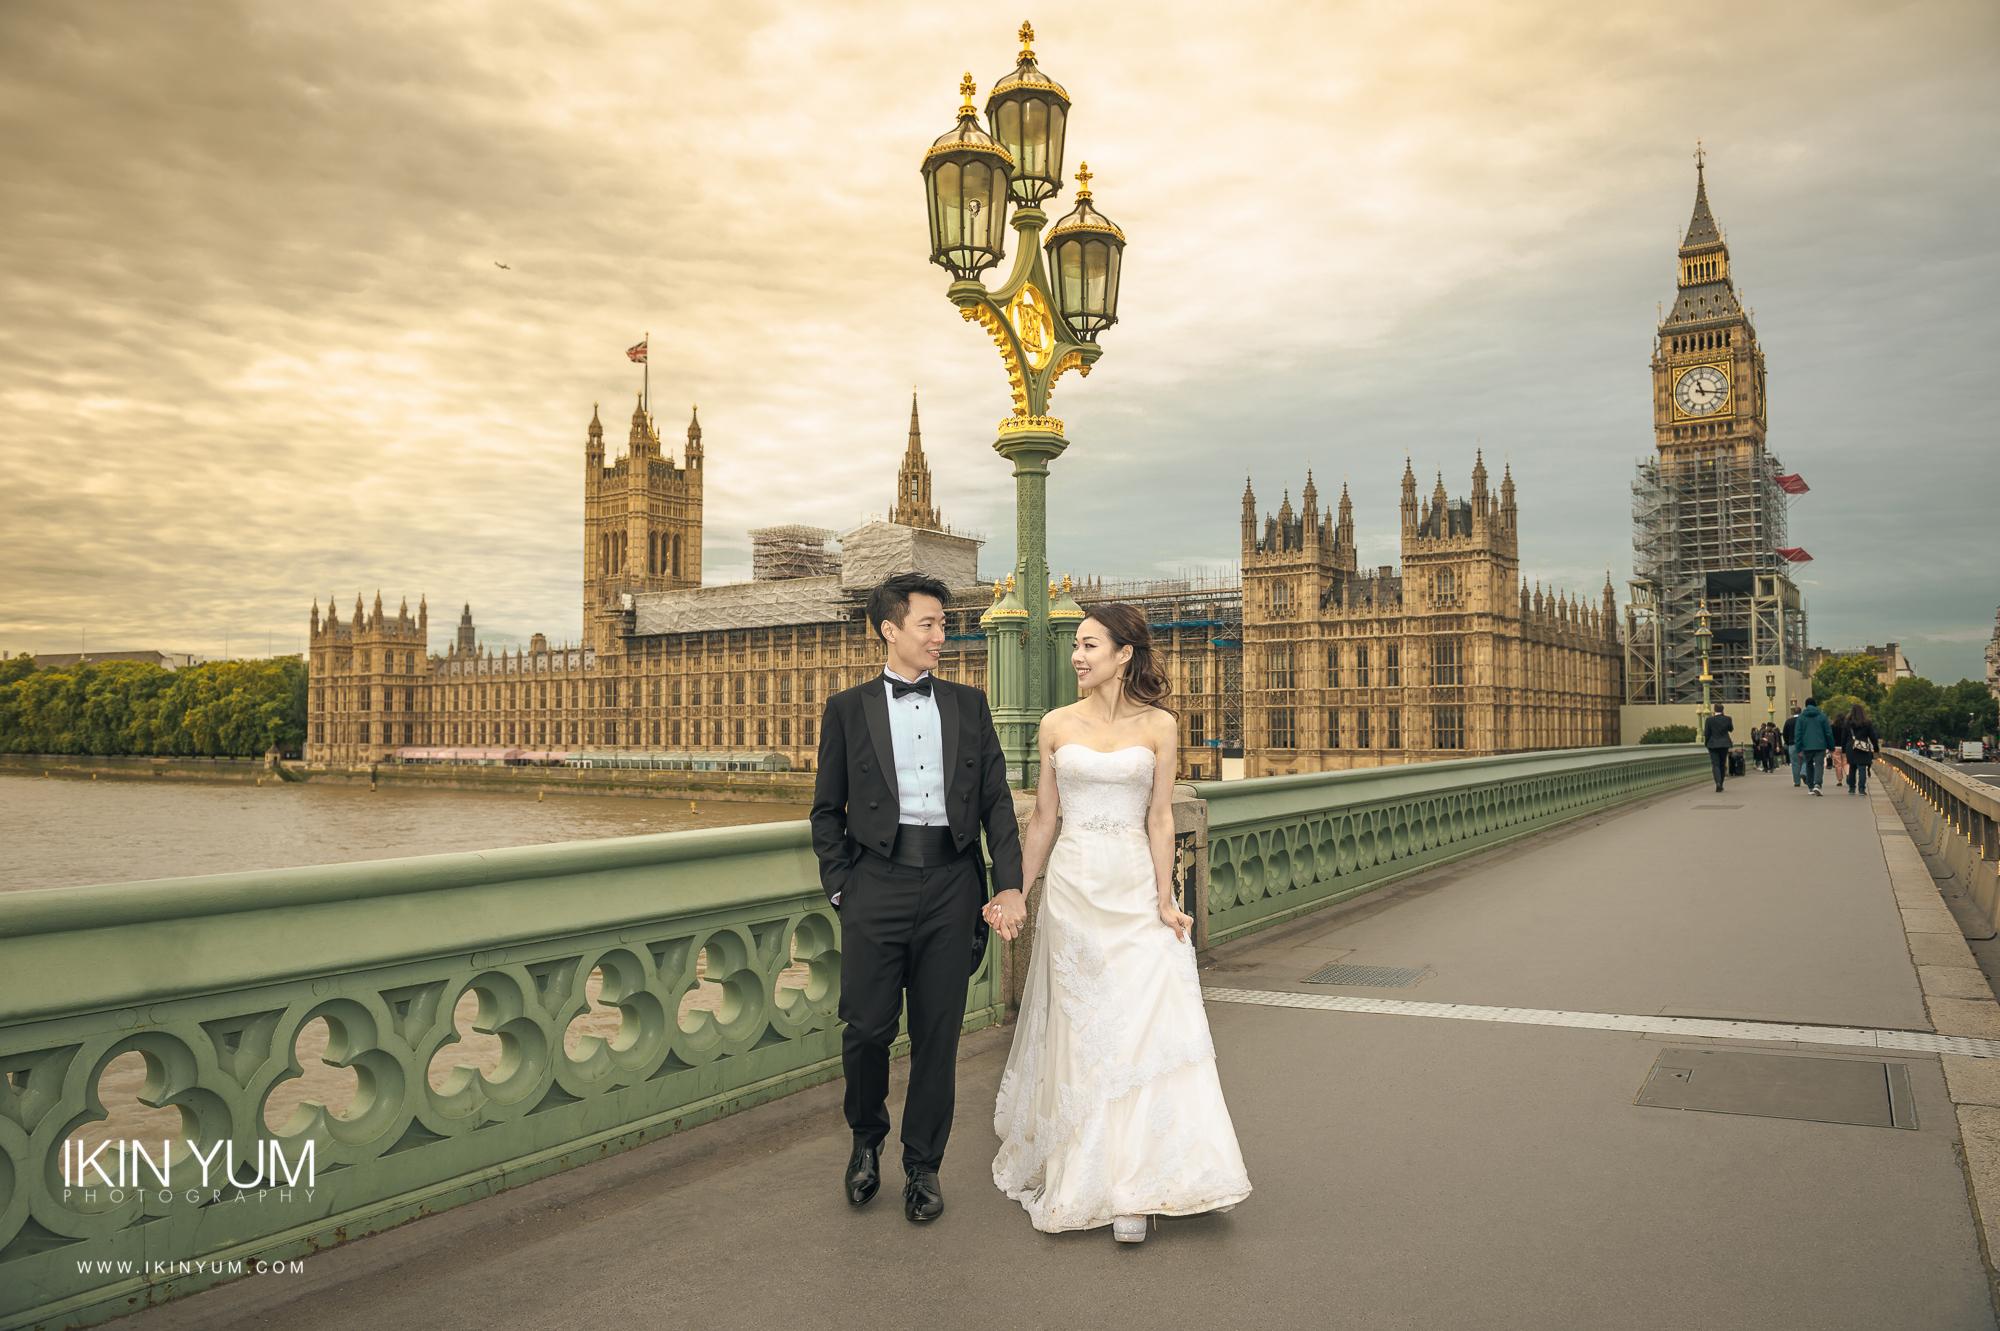 Yannis & Kenny Pre-Wedding Shoot - Ikin Yum Photography-0078.jpg